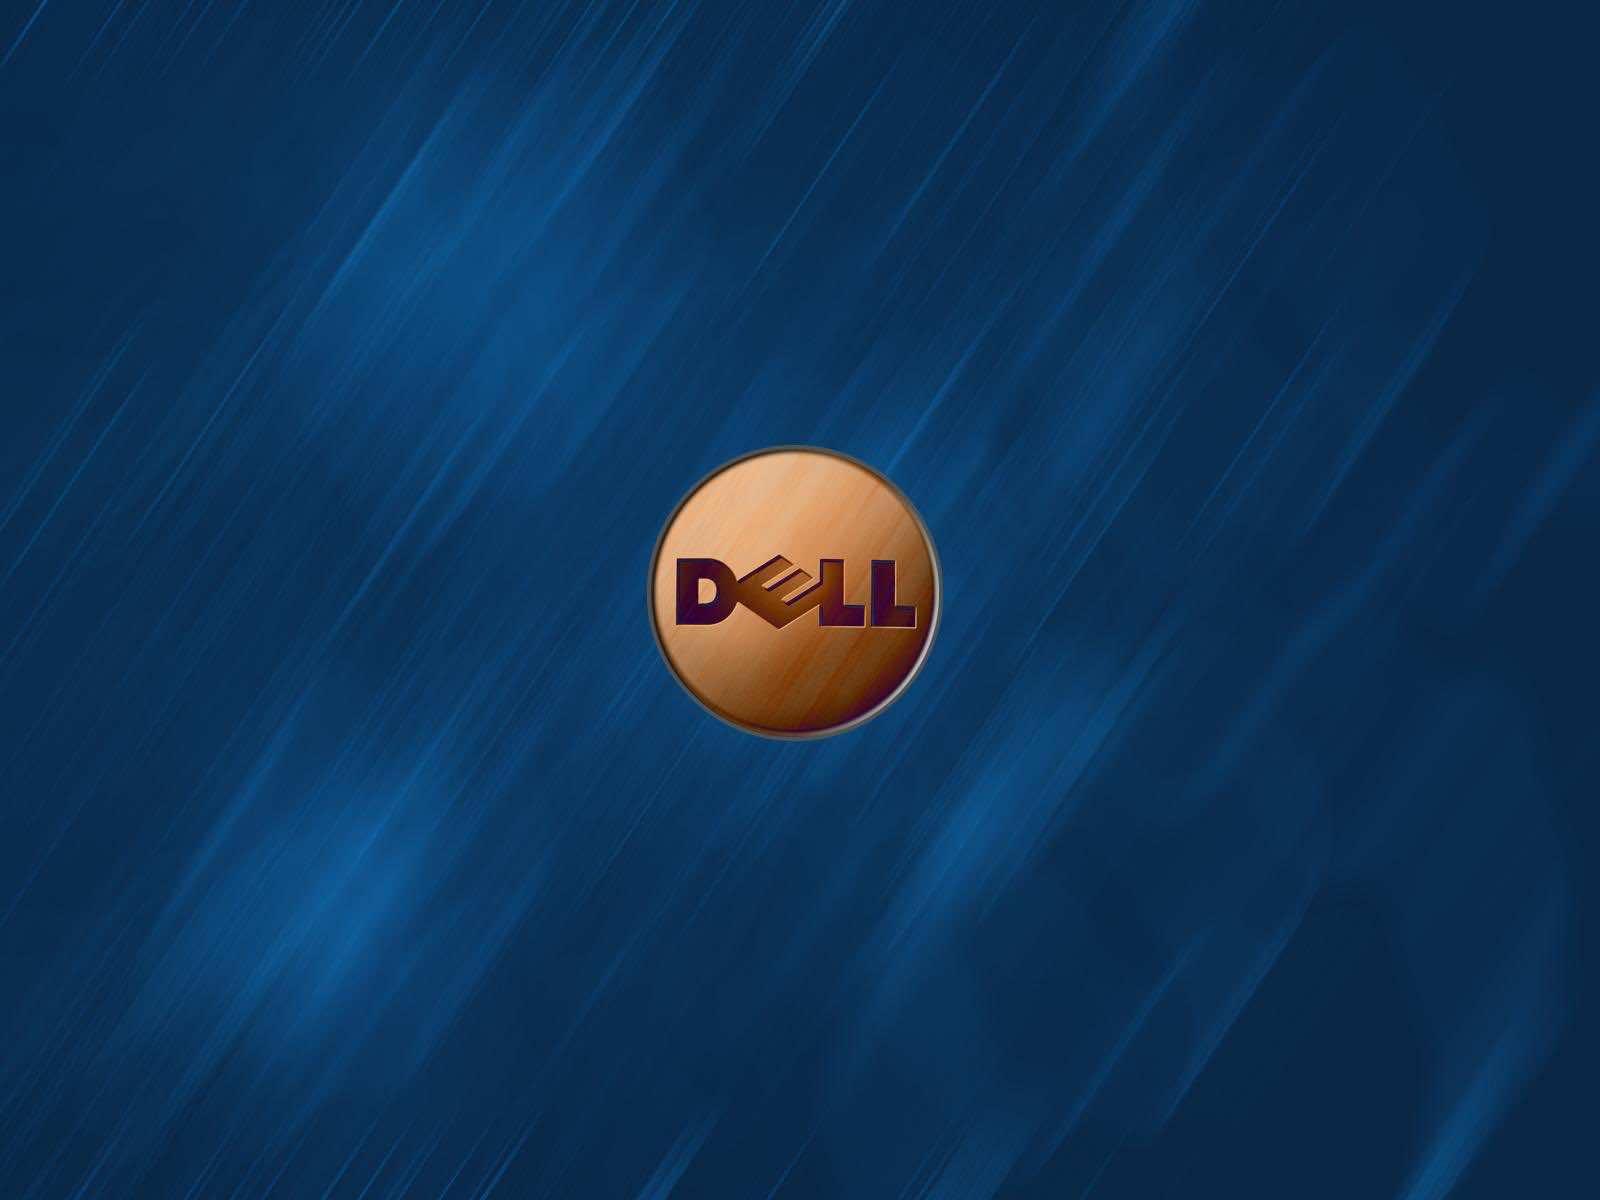 Desktop Wallpaper Laptop Dell Laptop Wallpaper Hd Download Images Slike